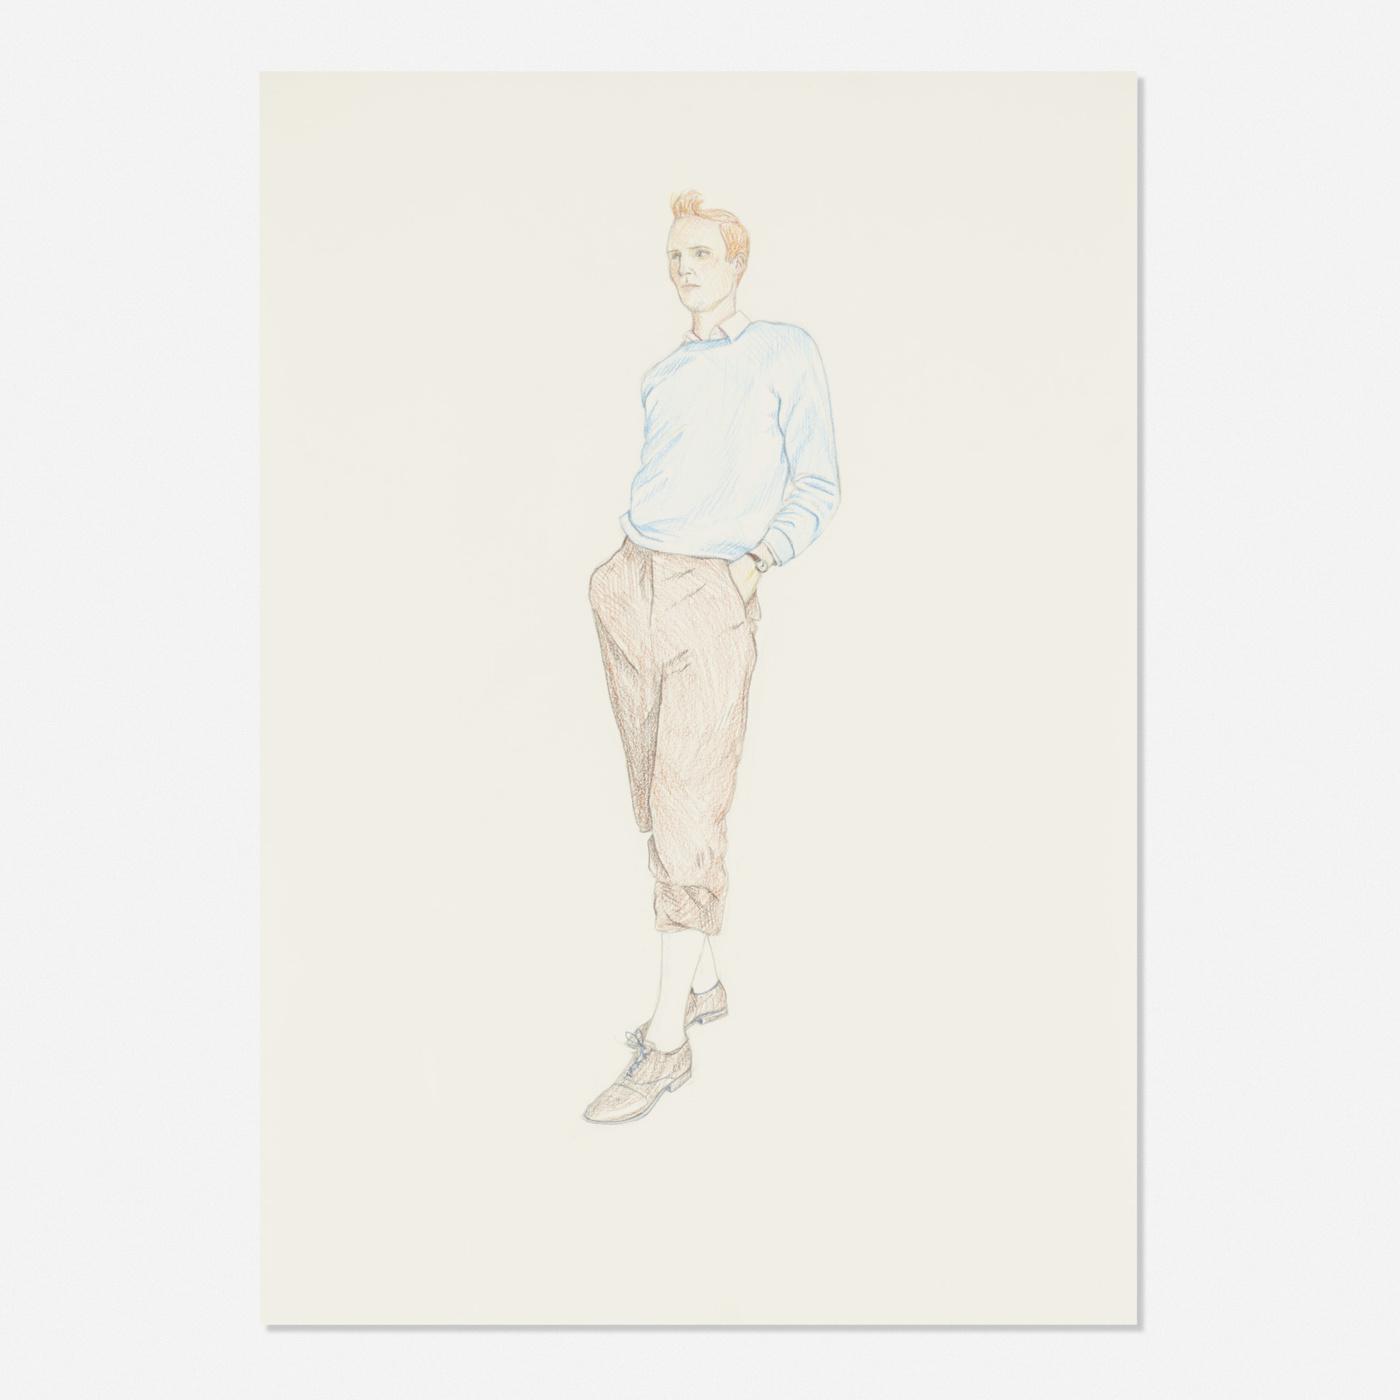 198_1_art_design_april_2019_lucy_mckenzie_tin_tin_4__wright_auction.jpg